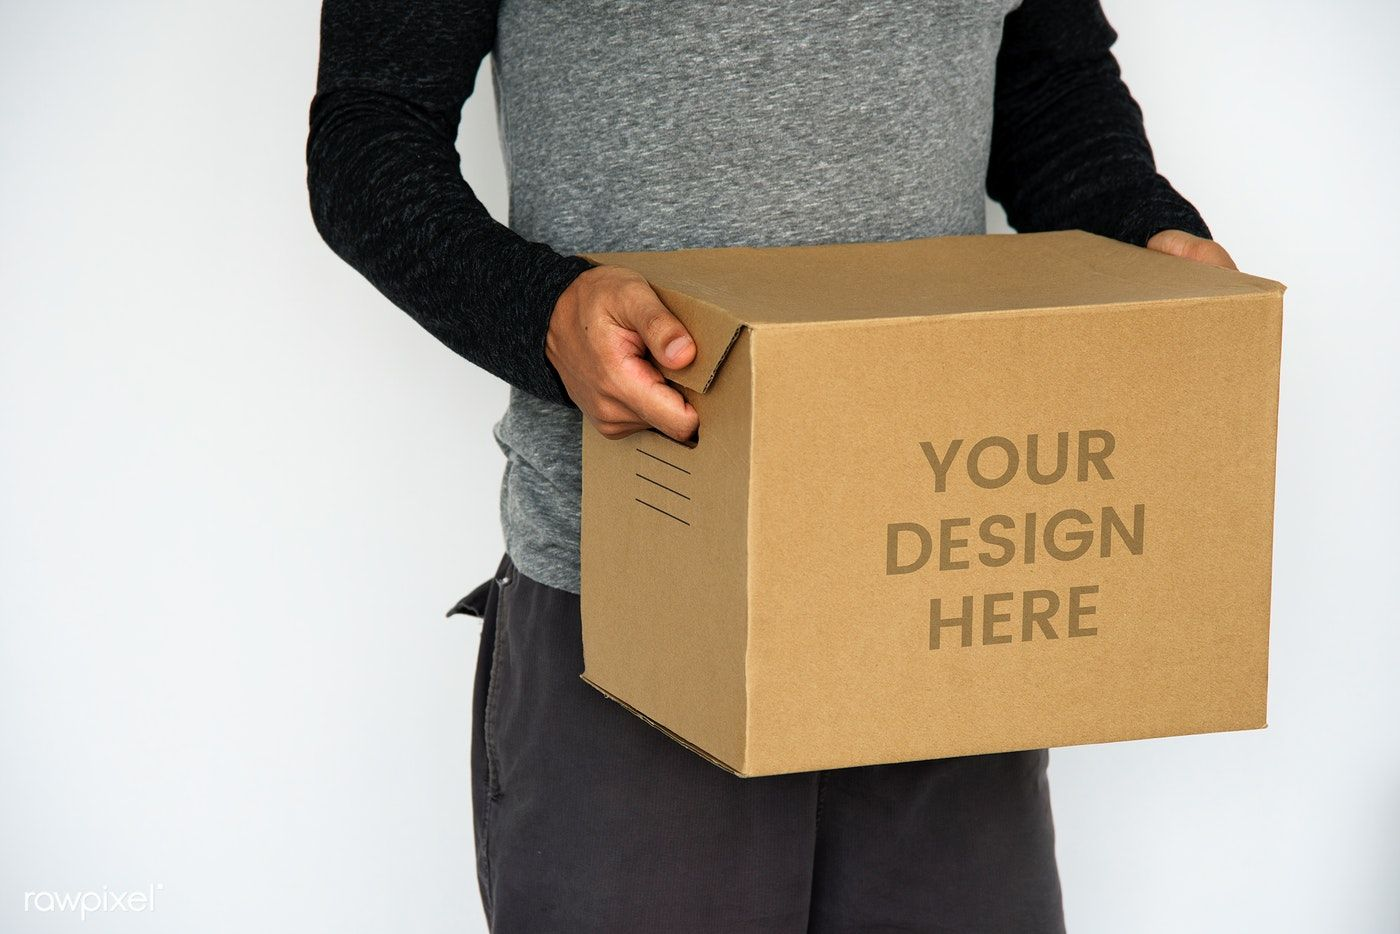 Download Download Premium Psd Of Man Carrying A Kraft Box Mockup 598473 Box Mockup Box Studio Cardboard Box